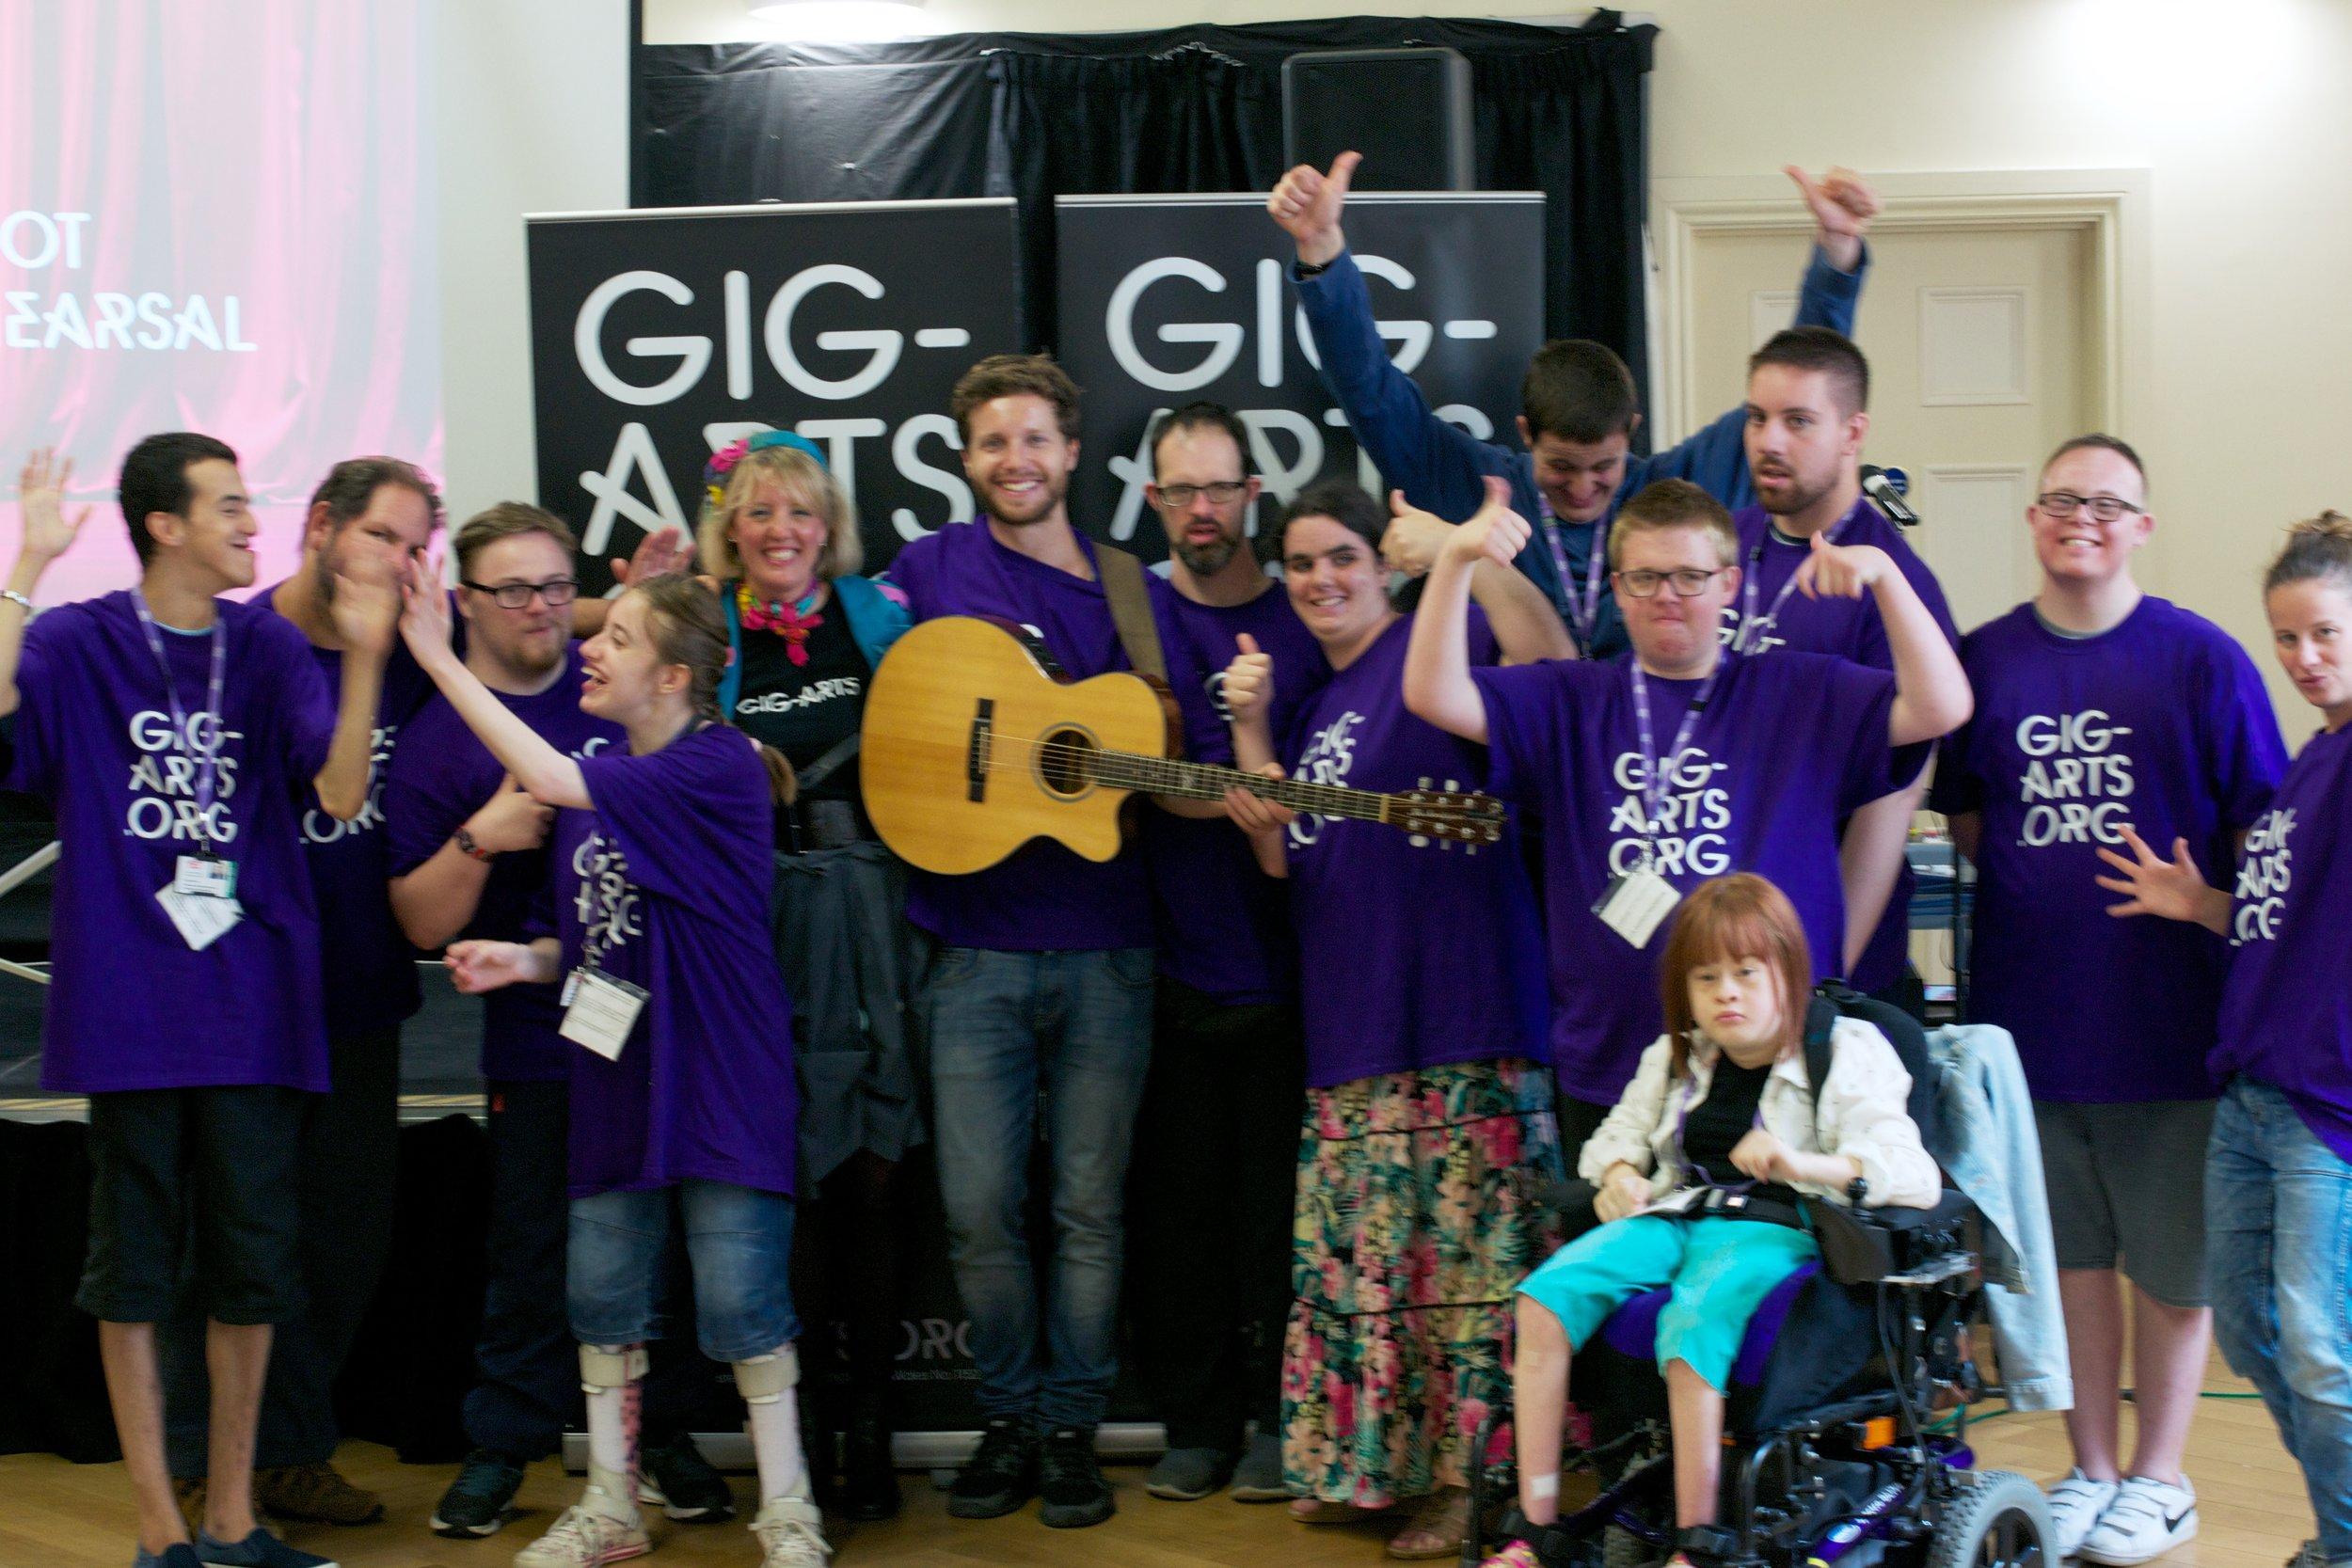 Team spirit at Gig-Arts.